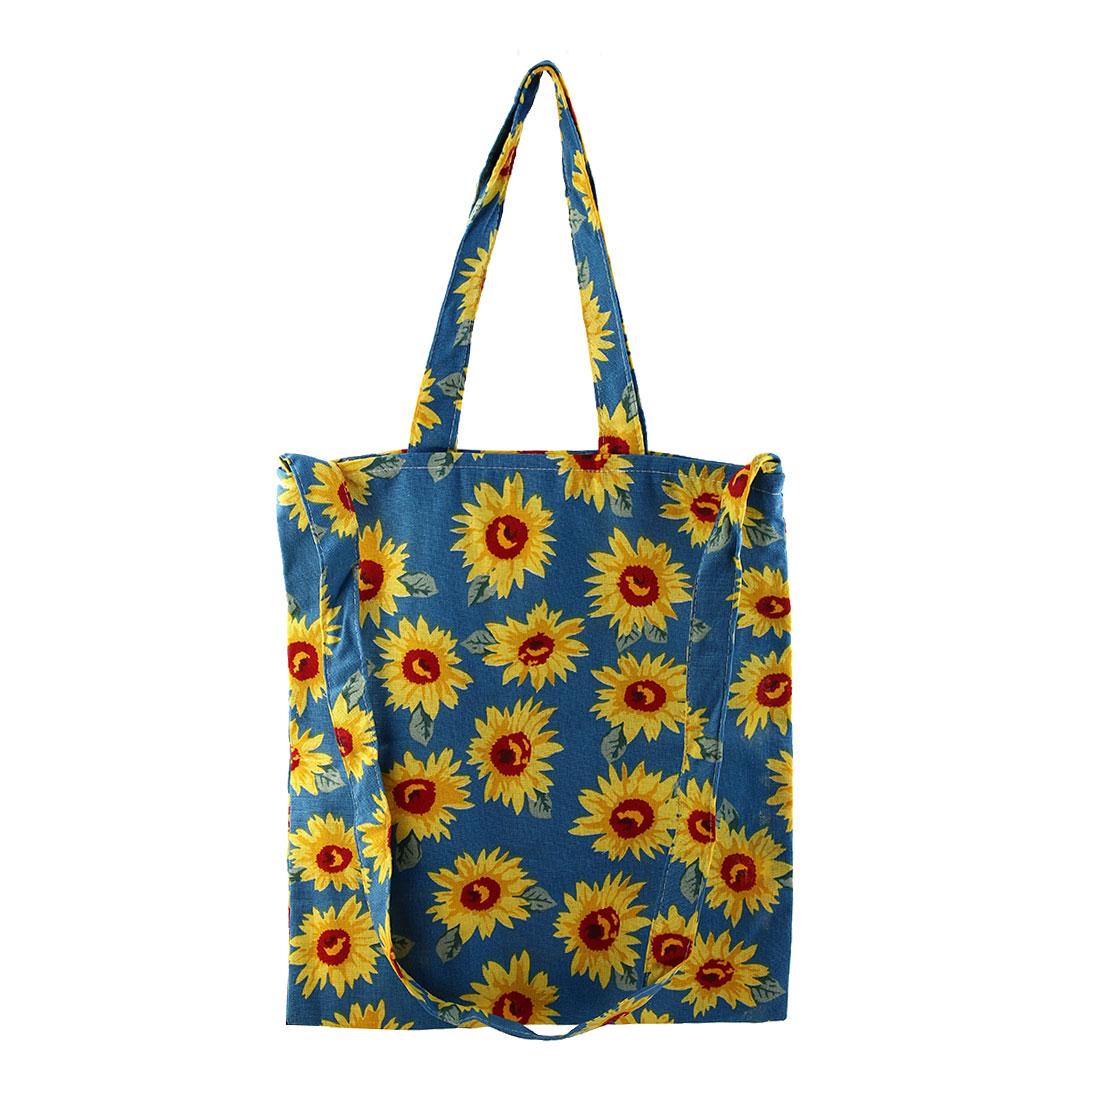 Zipper Closure Shoulder Pack Hand Pocket Outdoor Shopping Handbag Tote Bag Blue